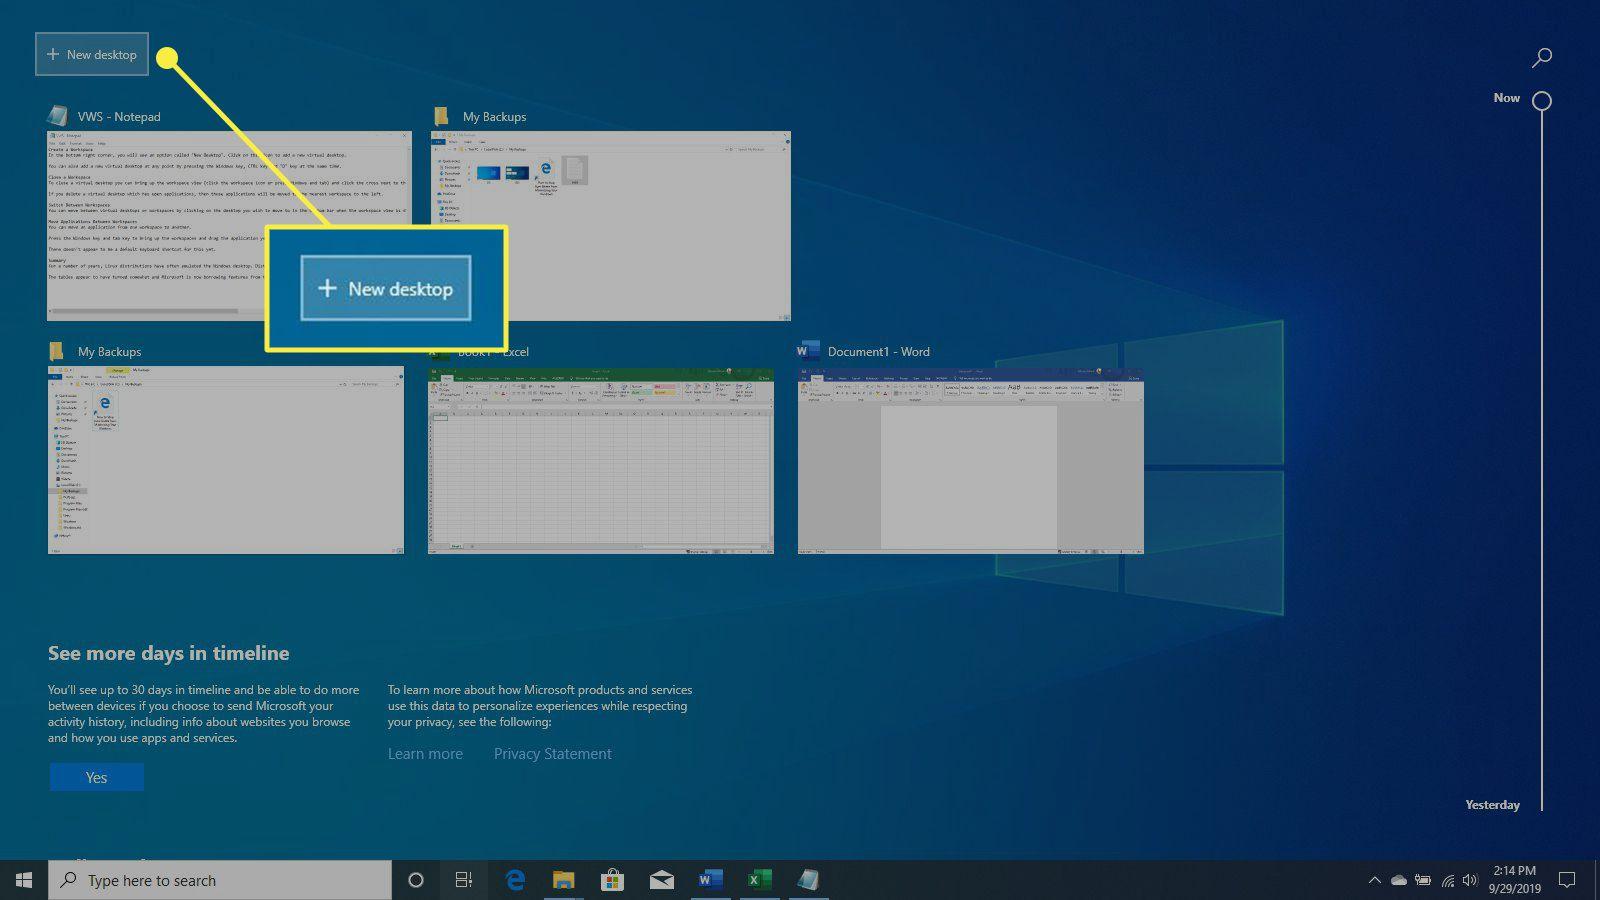 The New Desktop button